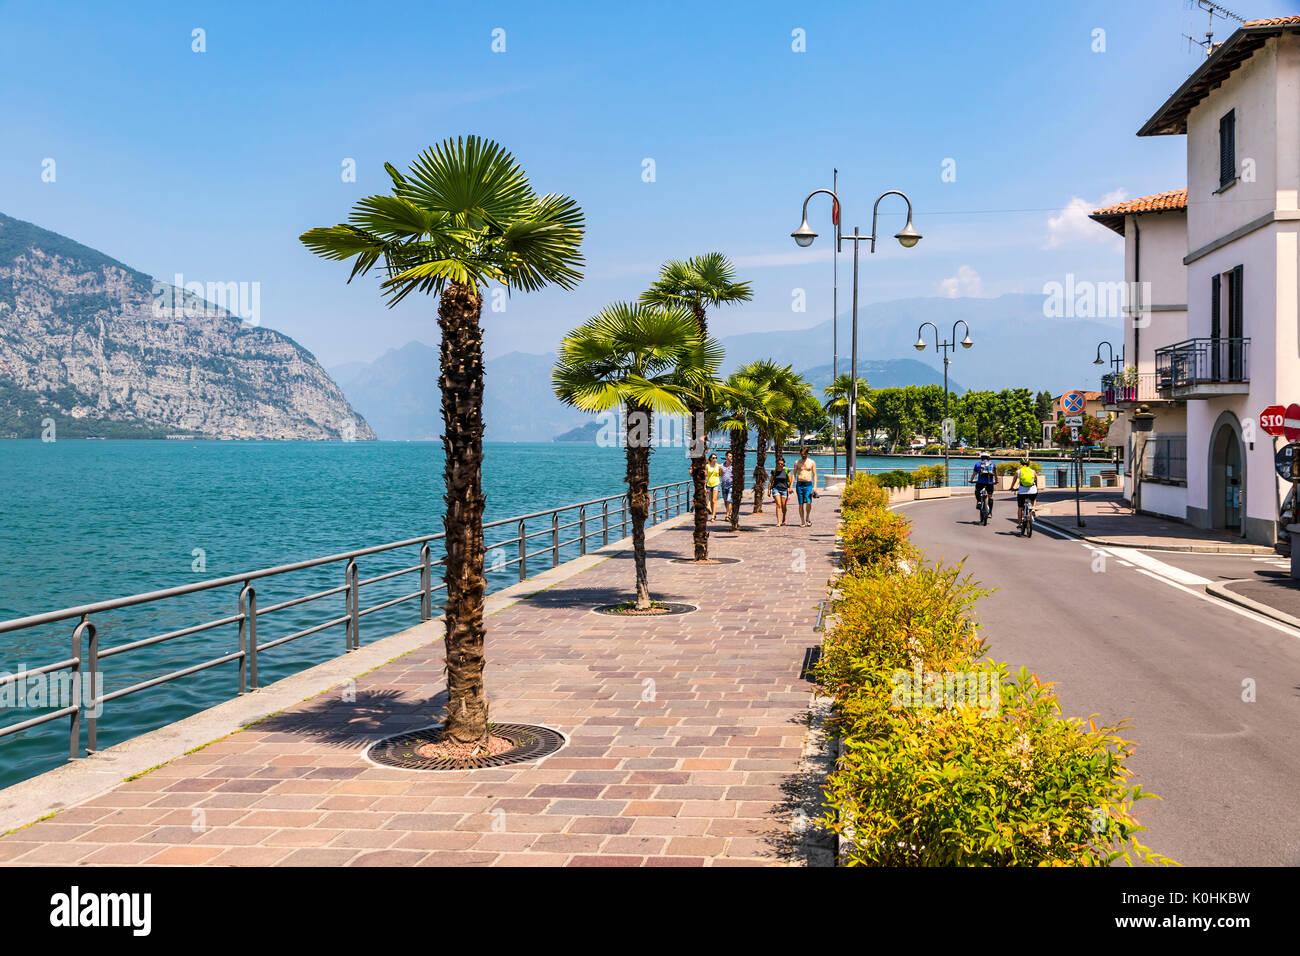 ISEO, ITALY - JUNE 17, 2017: People walking on Promenade street in Iseo city on Iseo lake, Lombardy, Italy. Famous Italian resort. Lake Iseo (or Lago  - Stock Image